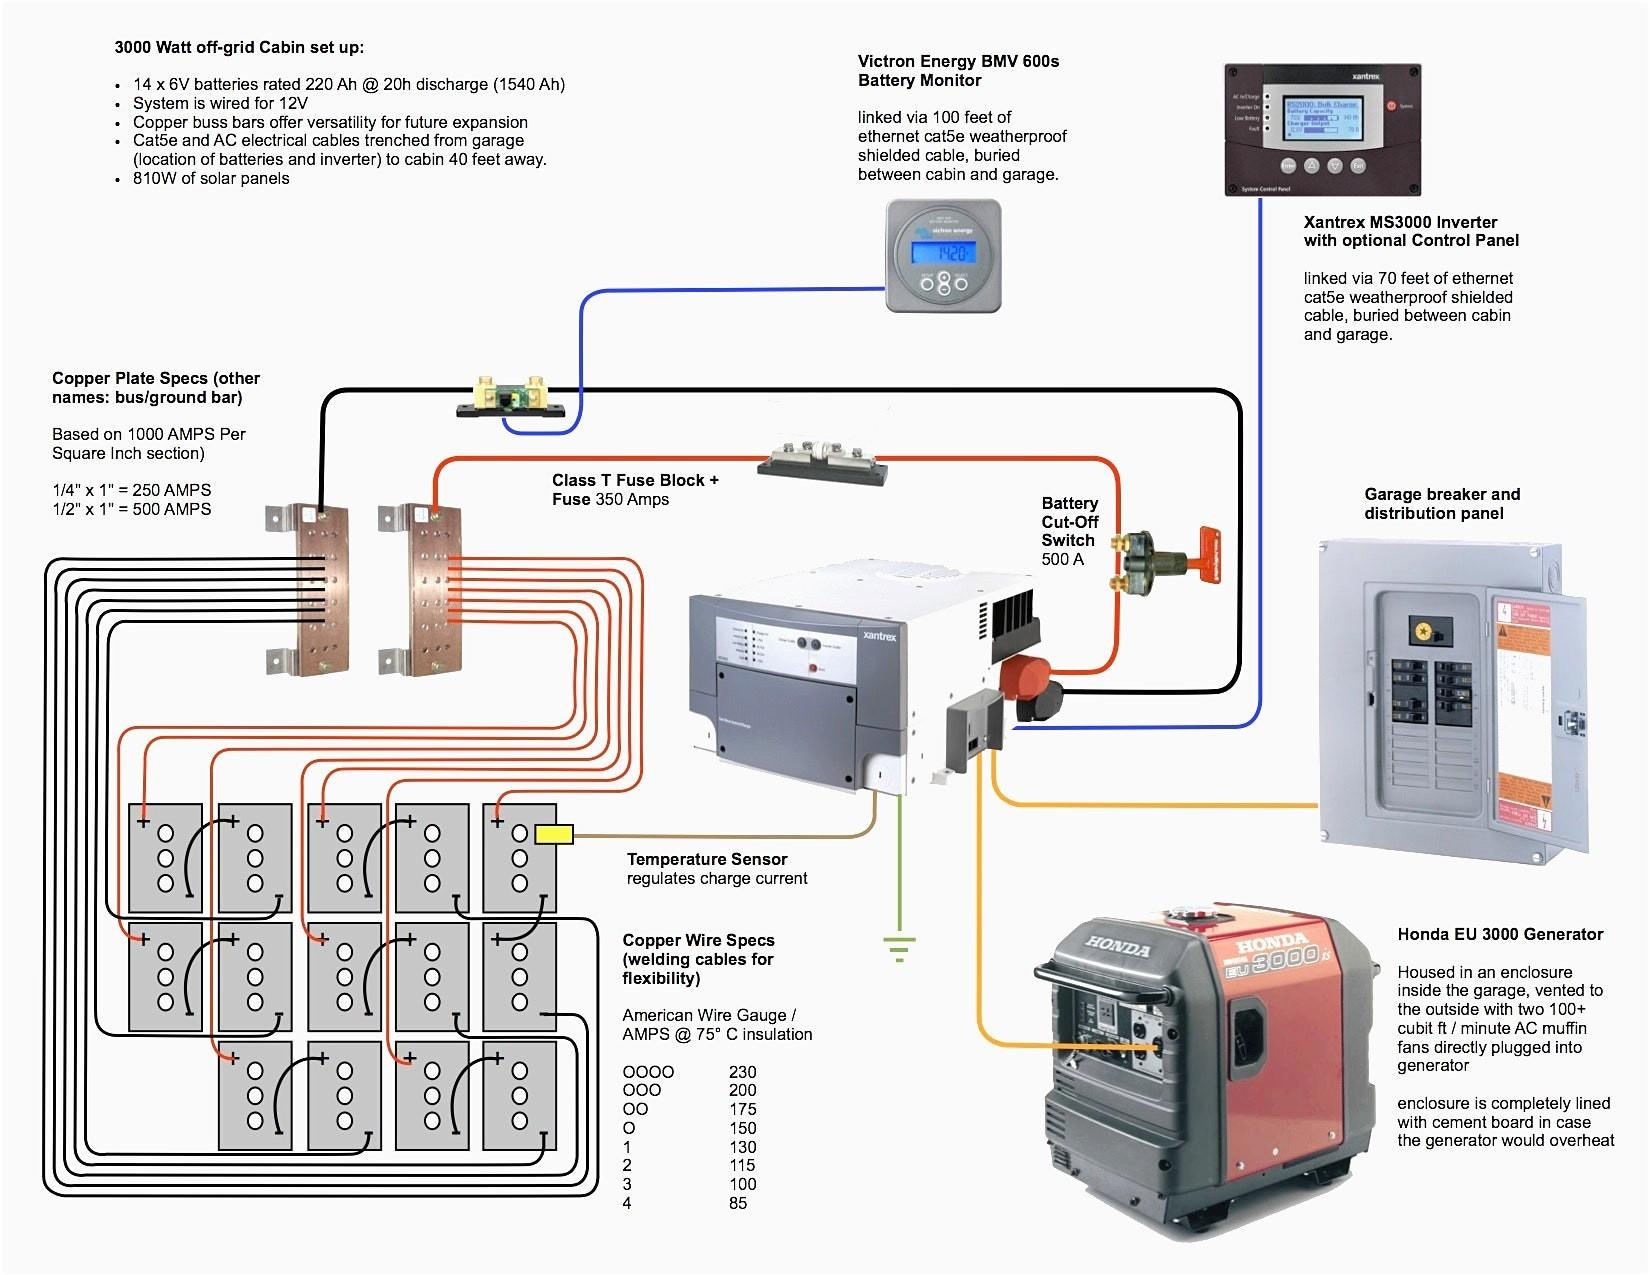 Solar Panel Wiring Diagram Example Valid Wiring Diagram for F Grid solar System New solar Panels